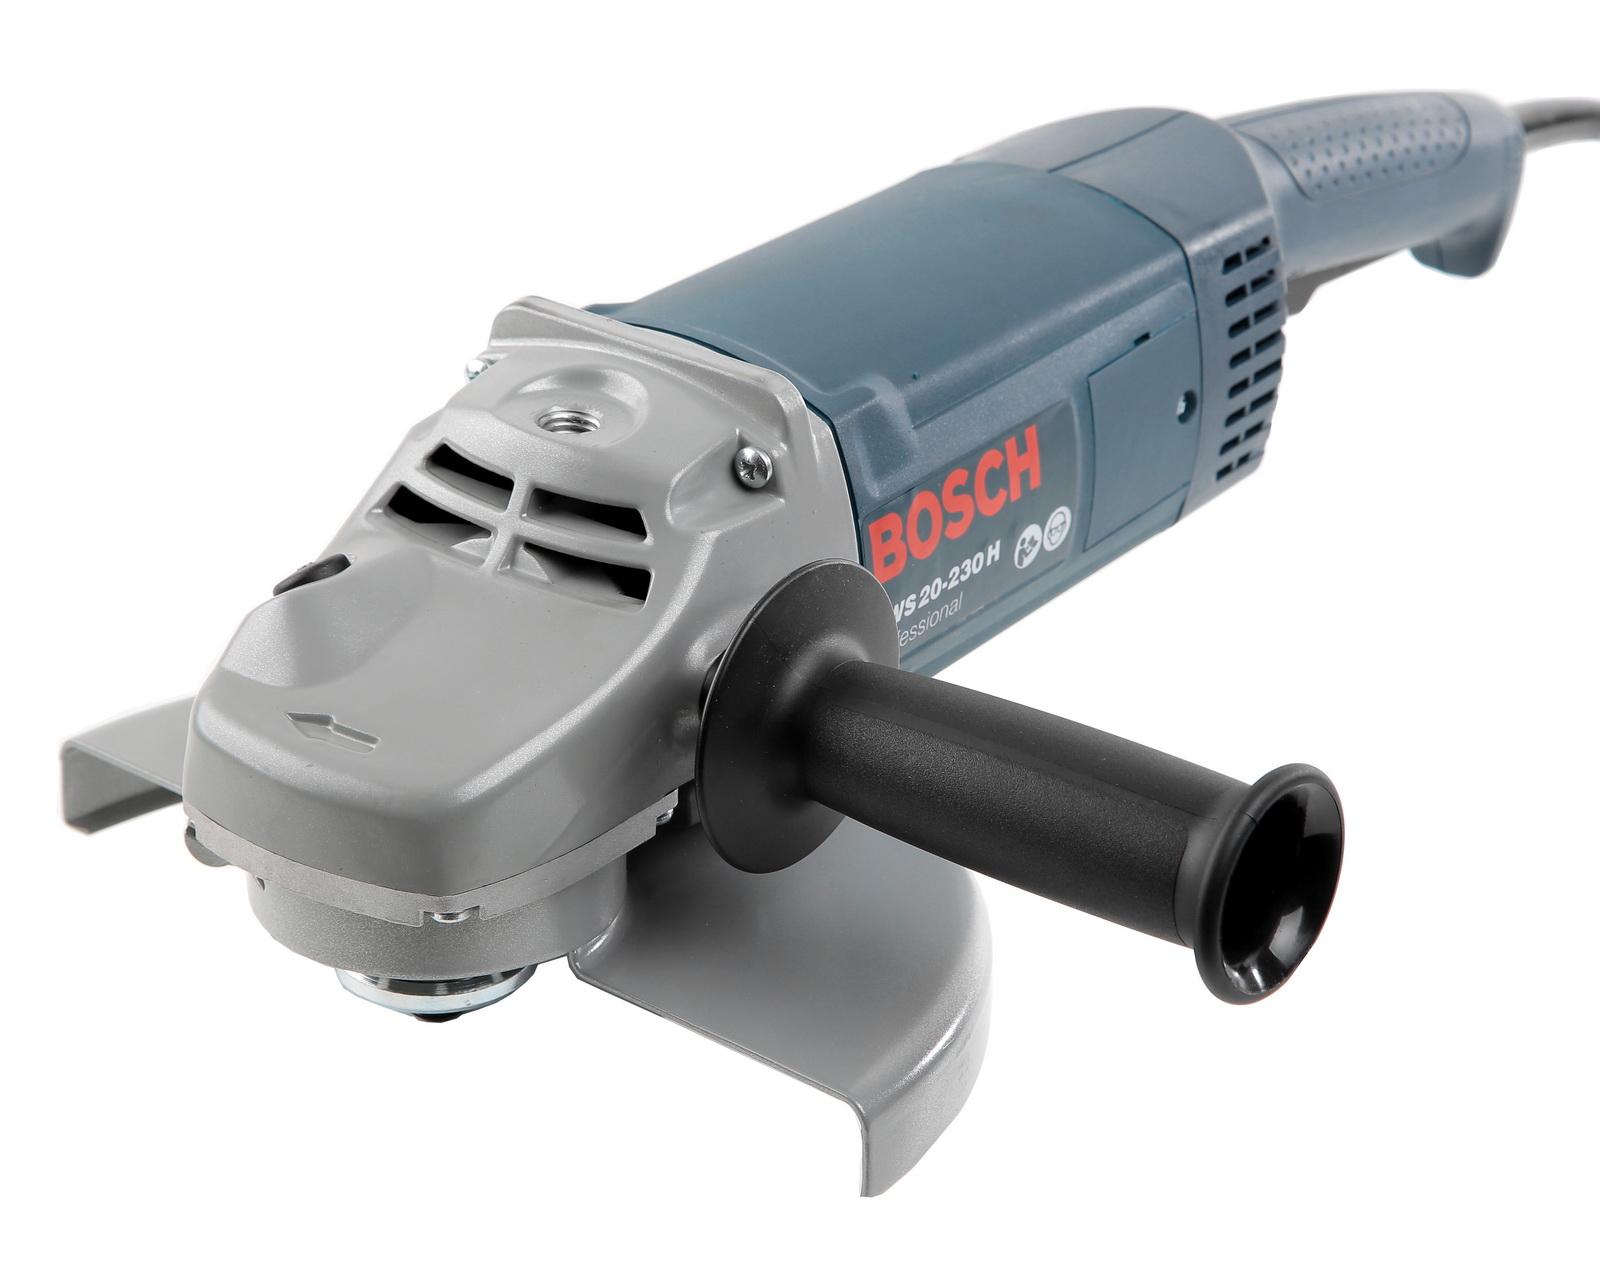 УШМ (болгарка) Bosch Gws 20-230 h (0.601.850.107) угловая шлифовальная машина bosch gws 20 230 h 0 601 850 107